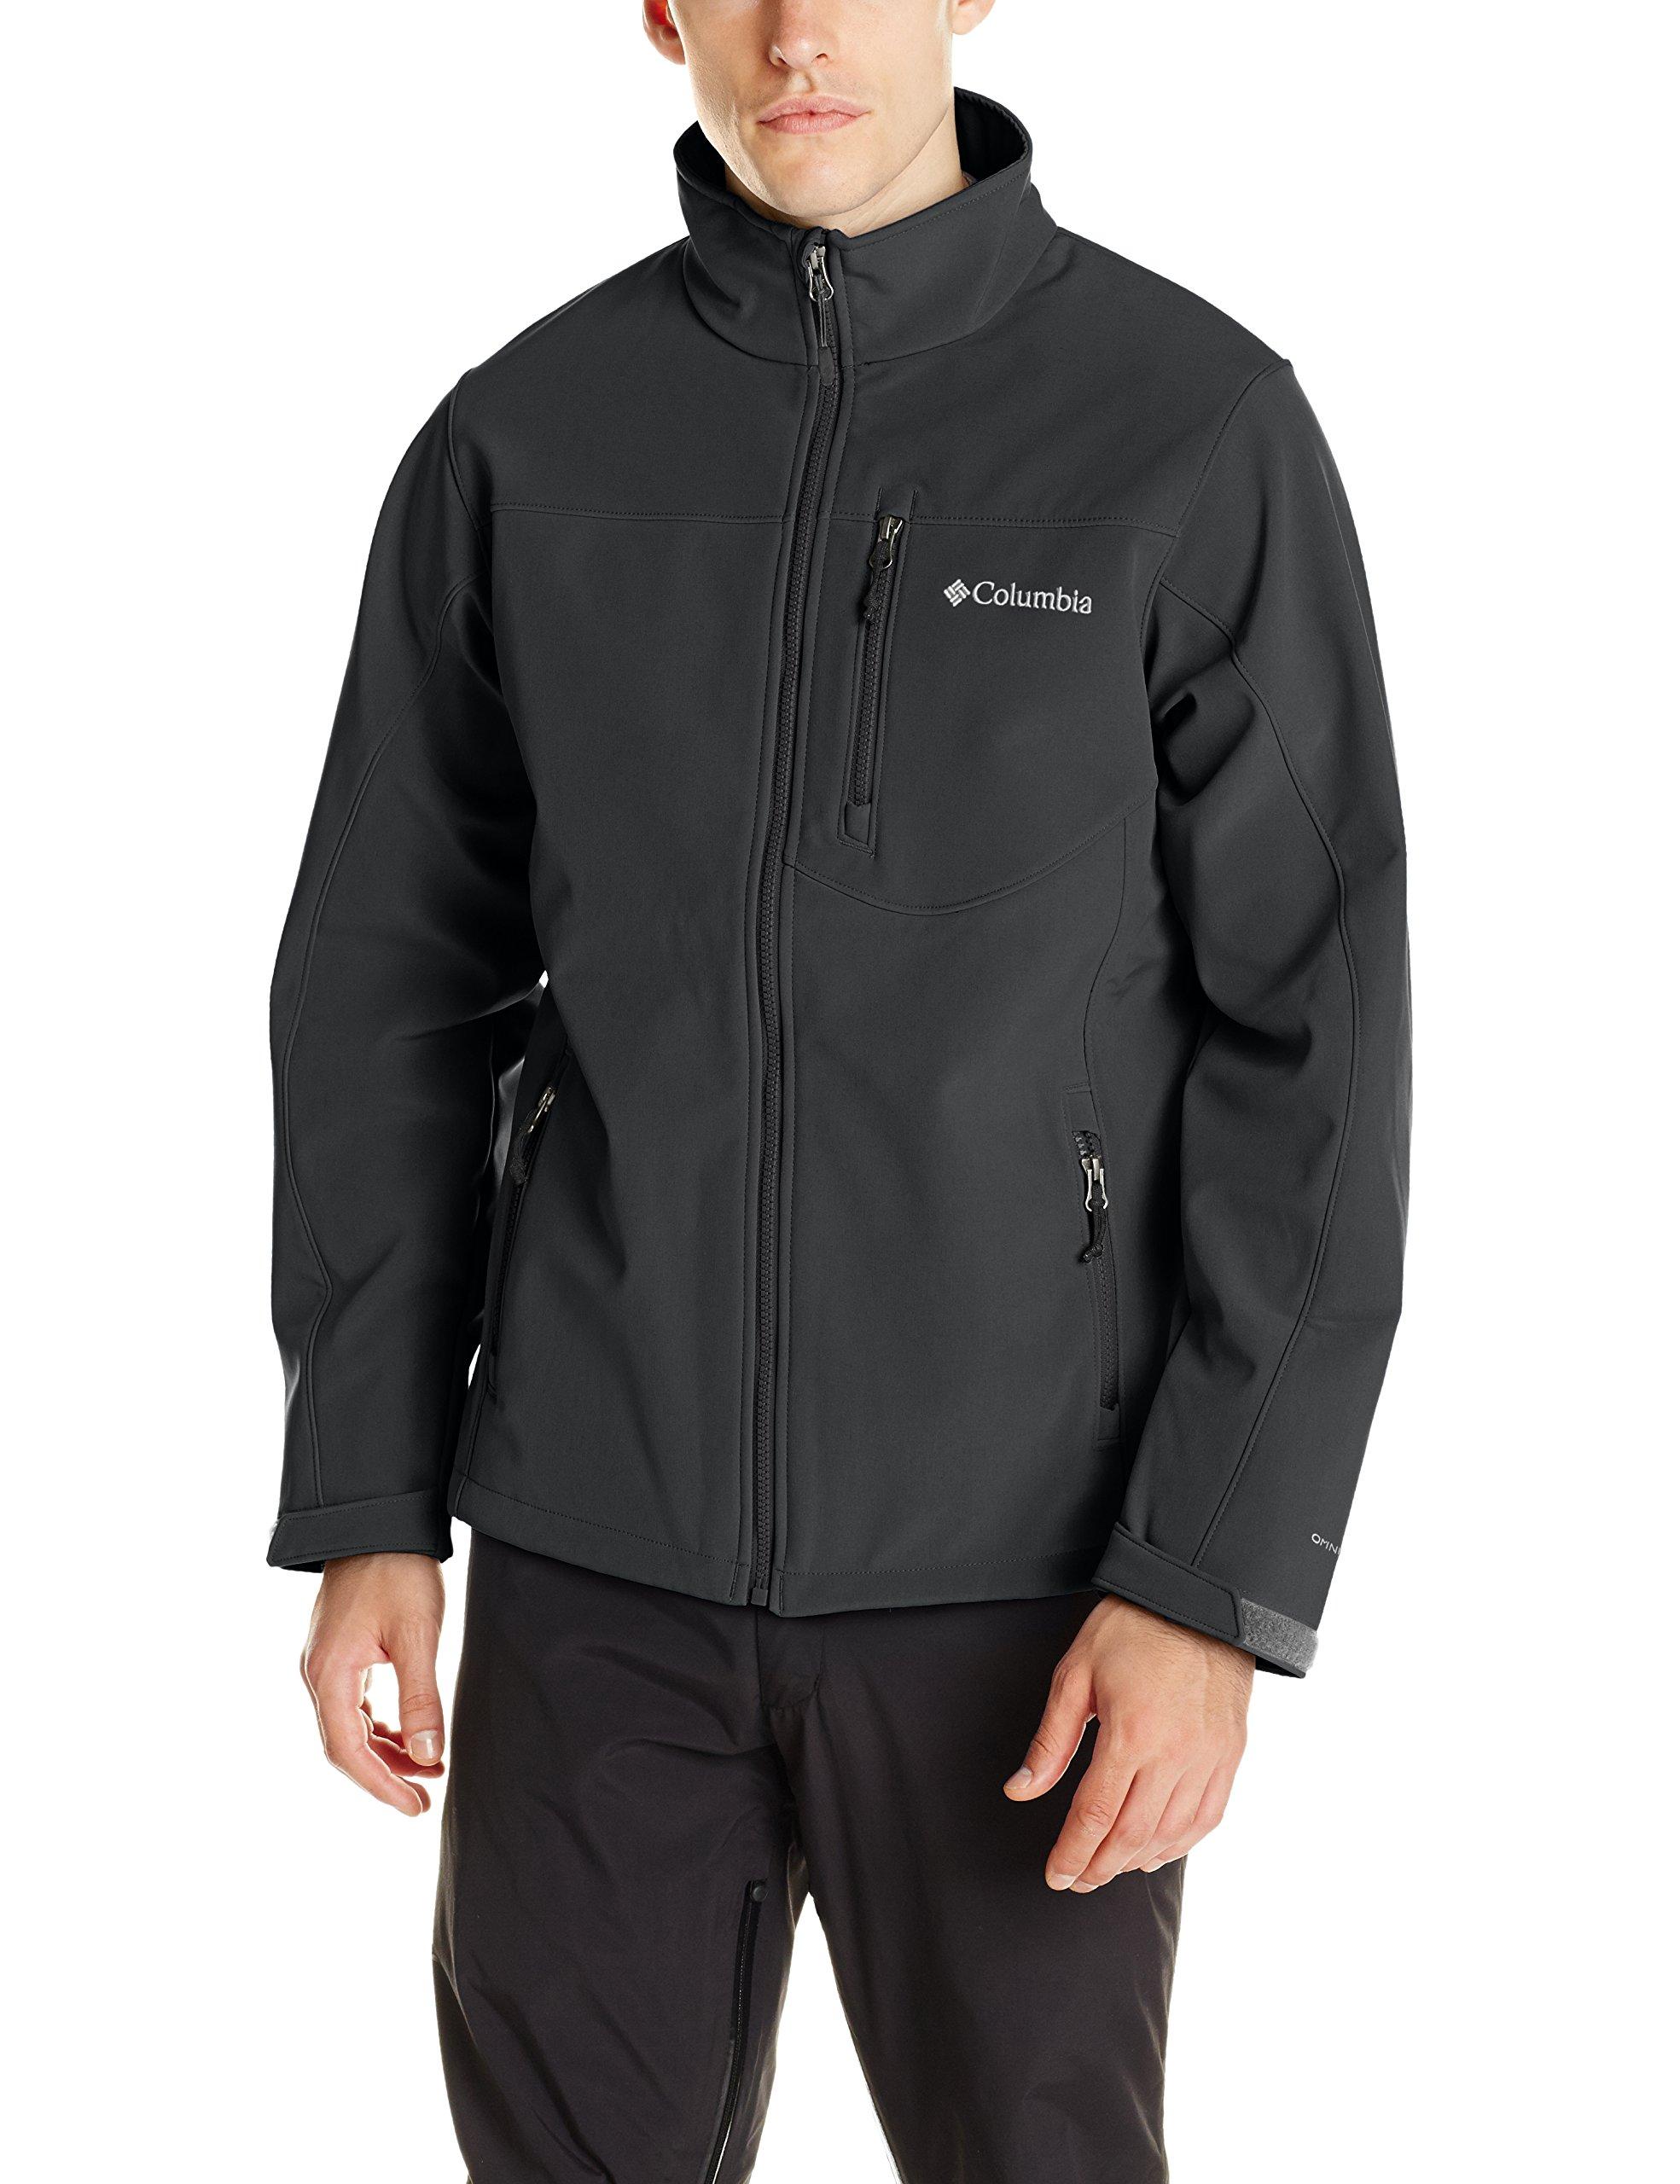 Columbia Men's Prime Peak Softshell Jacket, Black, Medium by Columbia